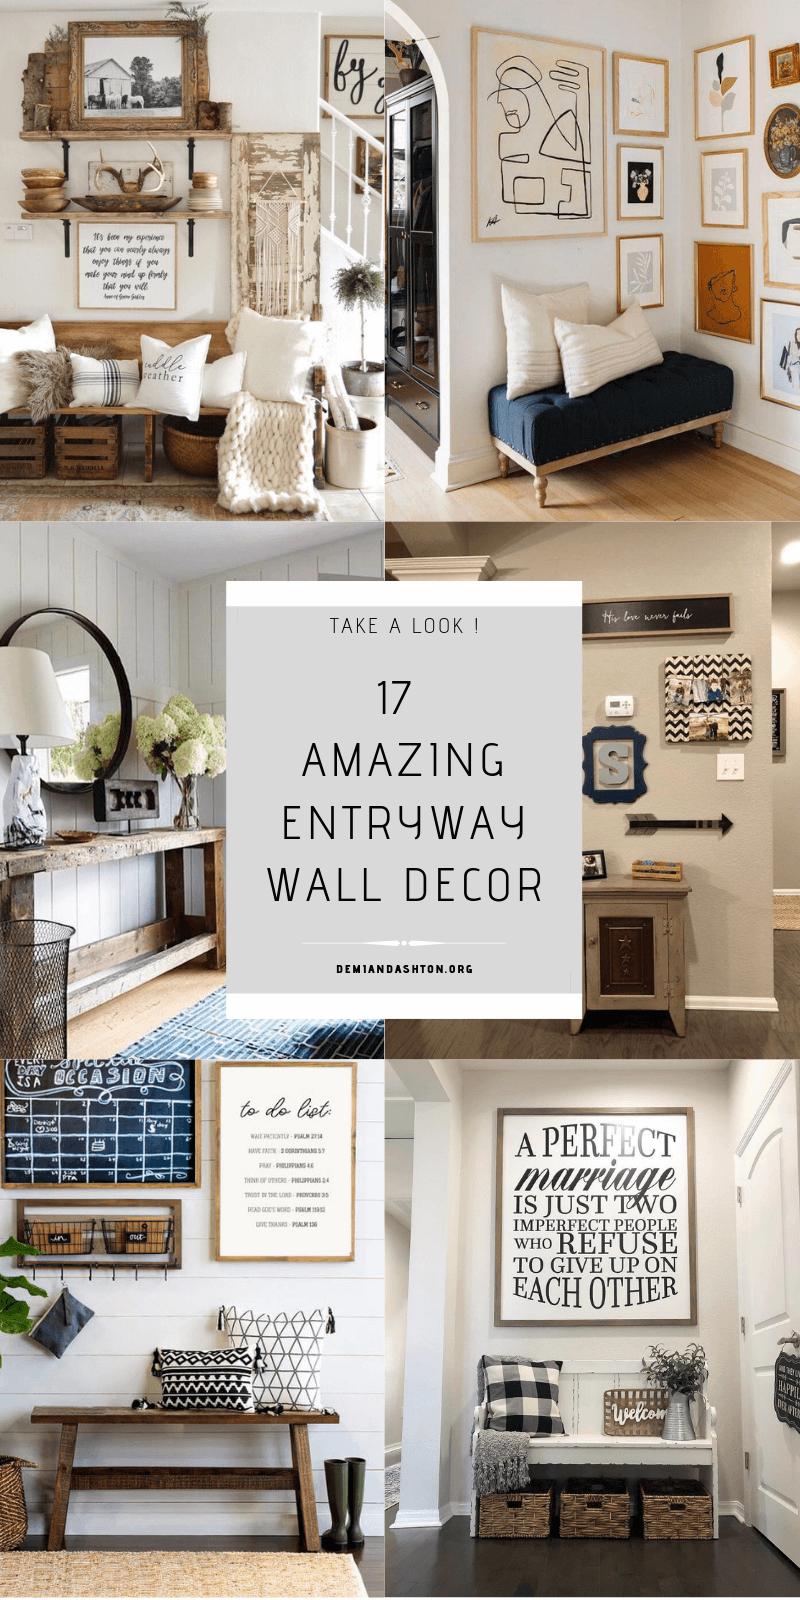 Contemporary Entryway Wall Decor Entryway Wall Decor Entryway Wall Entry Wall